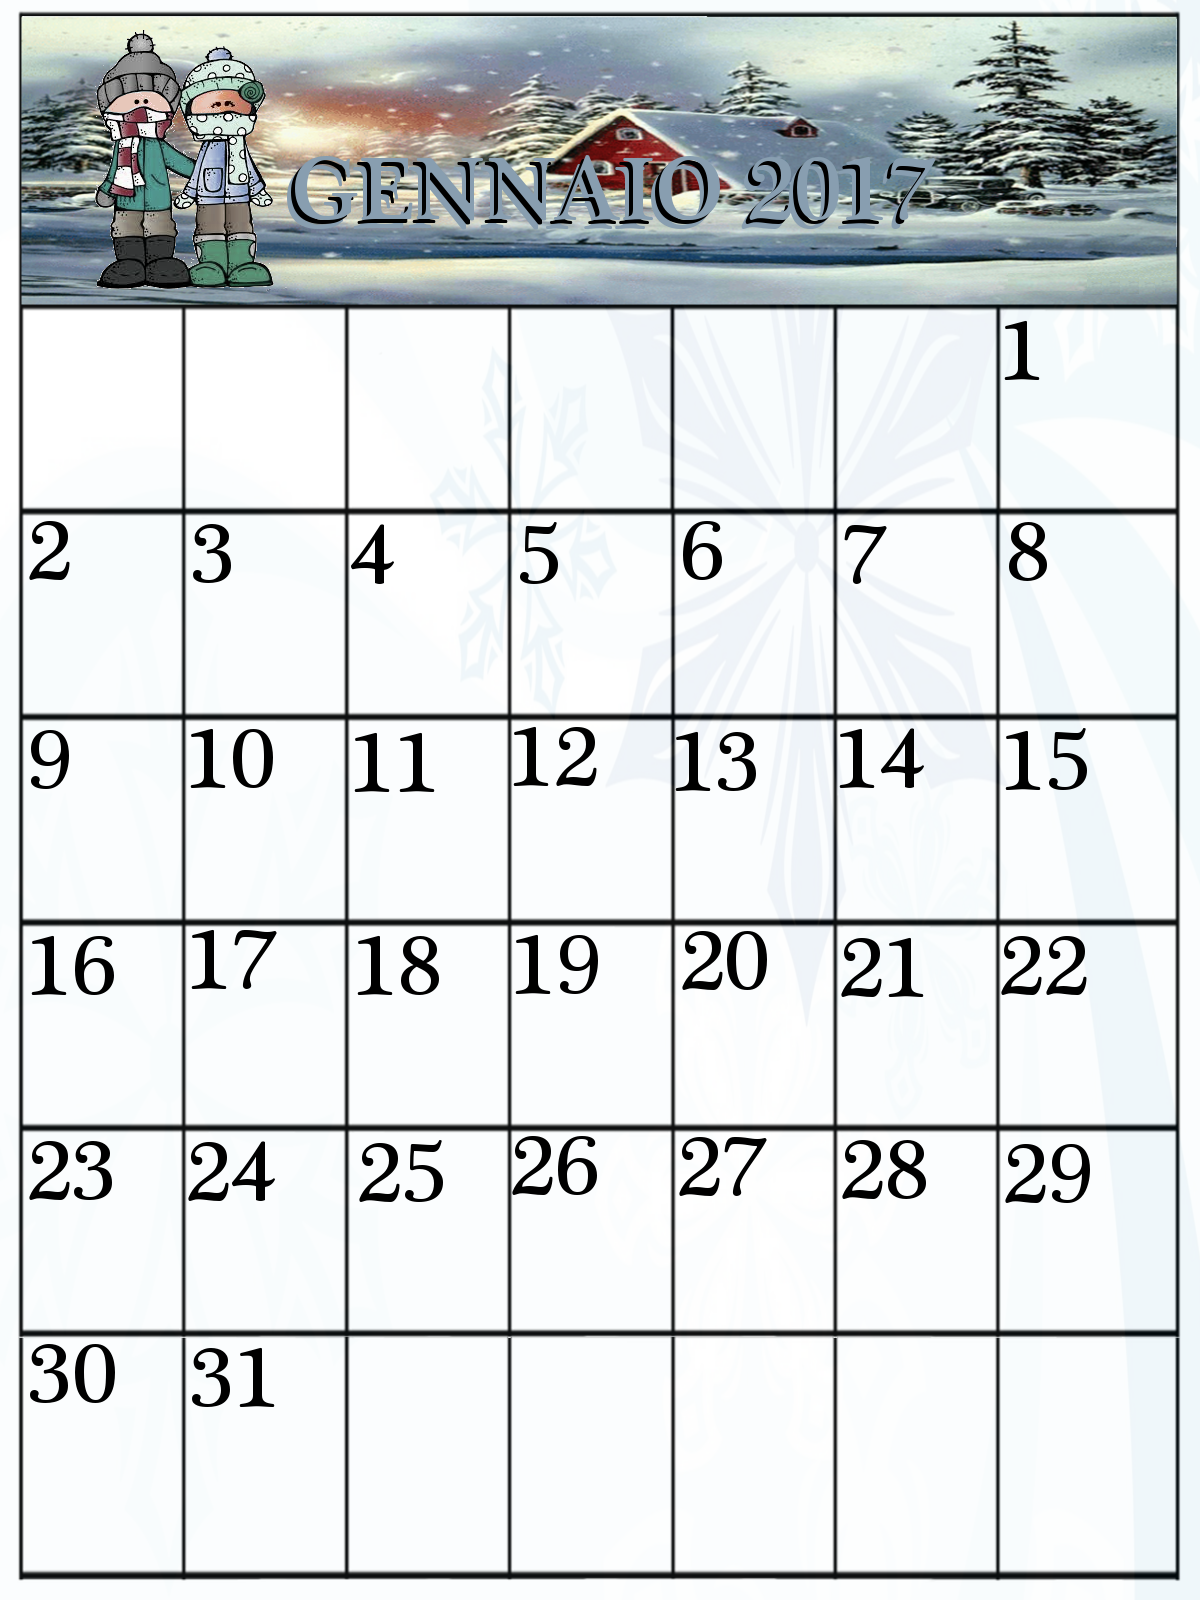 Calendario Appunti Da Stampare.Calendari Gennaio 2017 Da Stampare